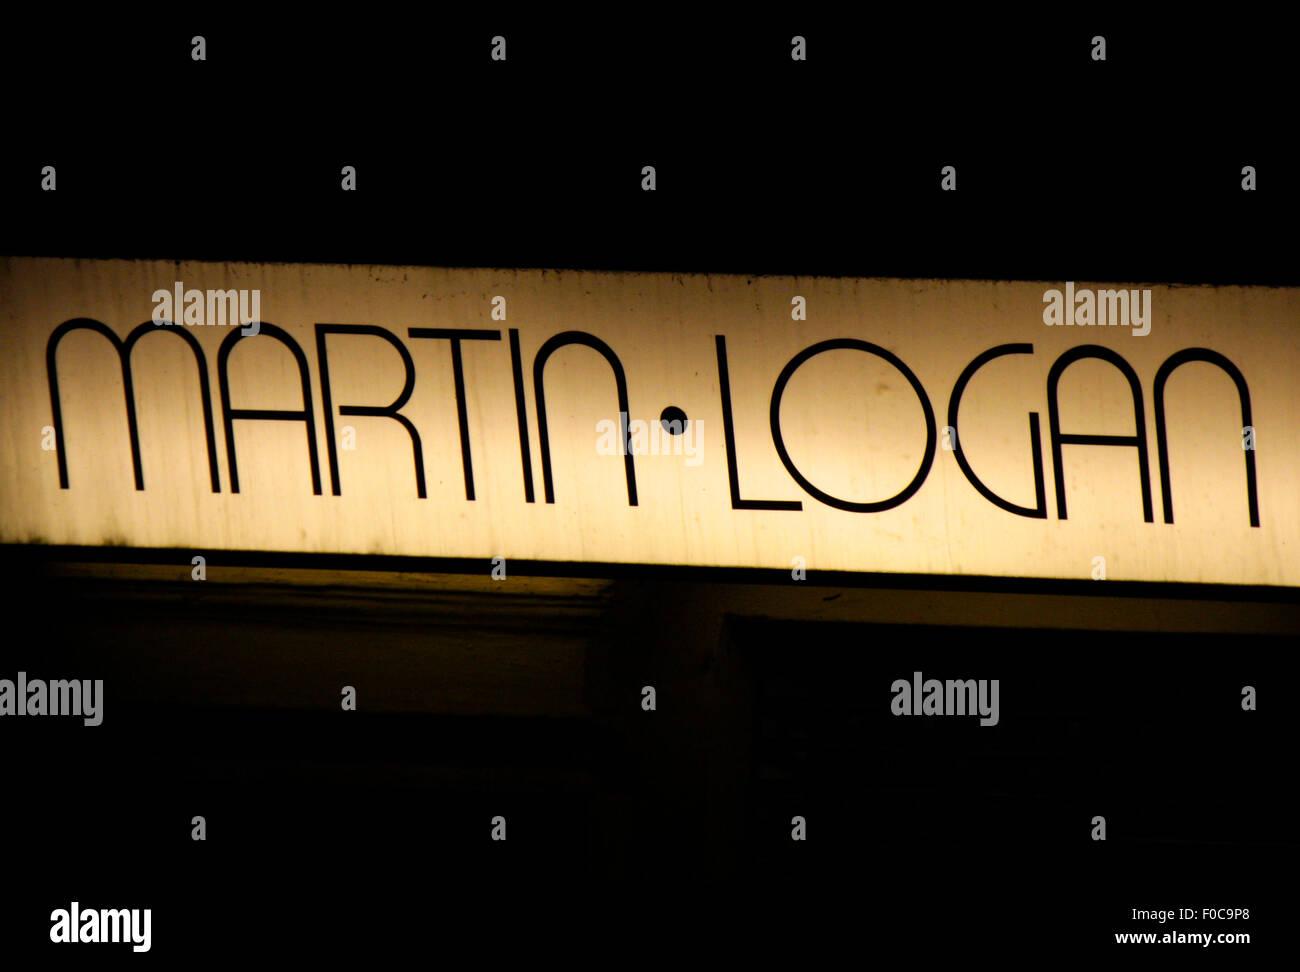 Markenname: 'Martin Logan', Dezember 2013, Berlin. - Stock Image